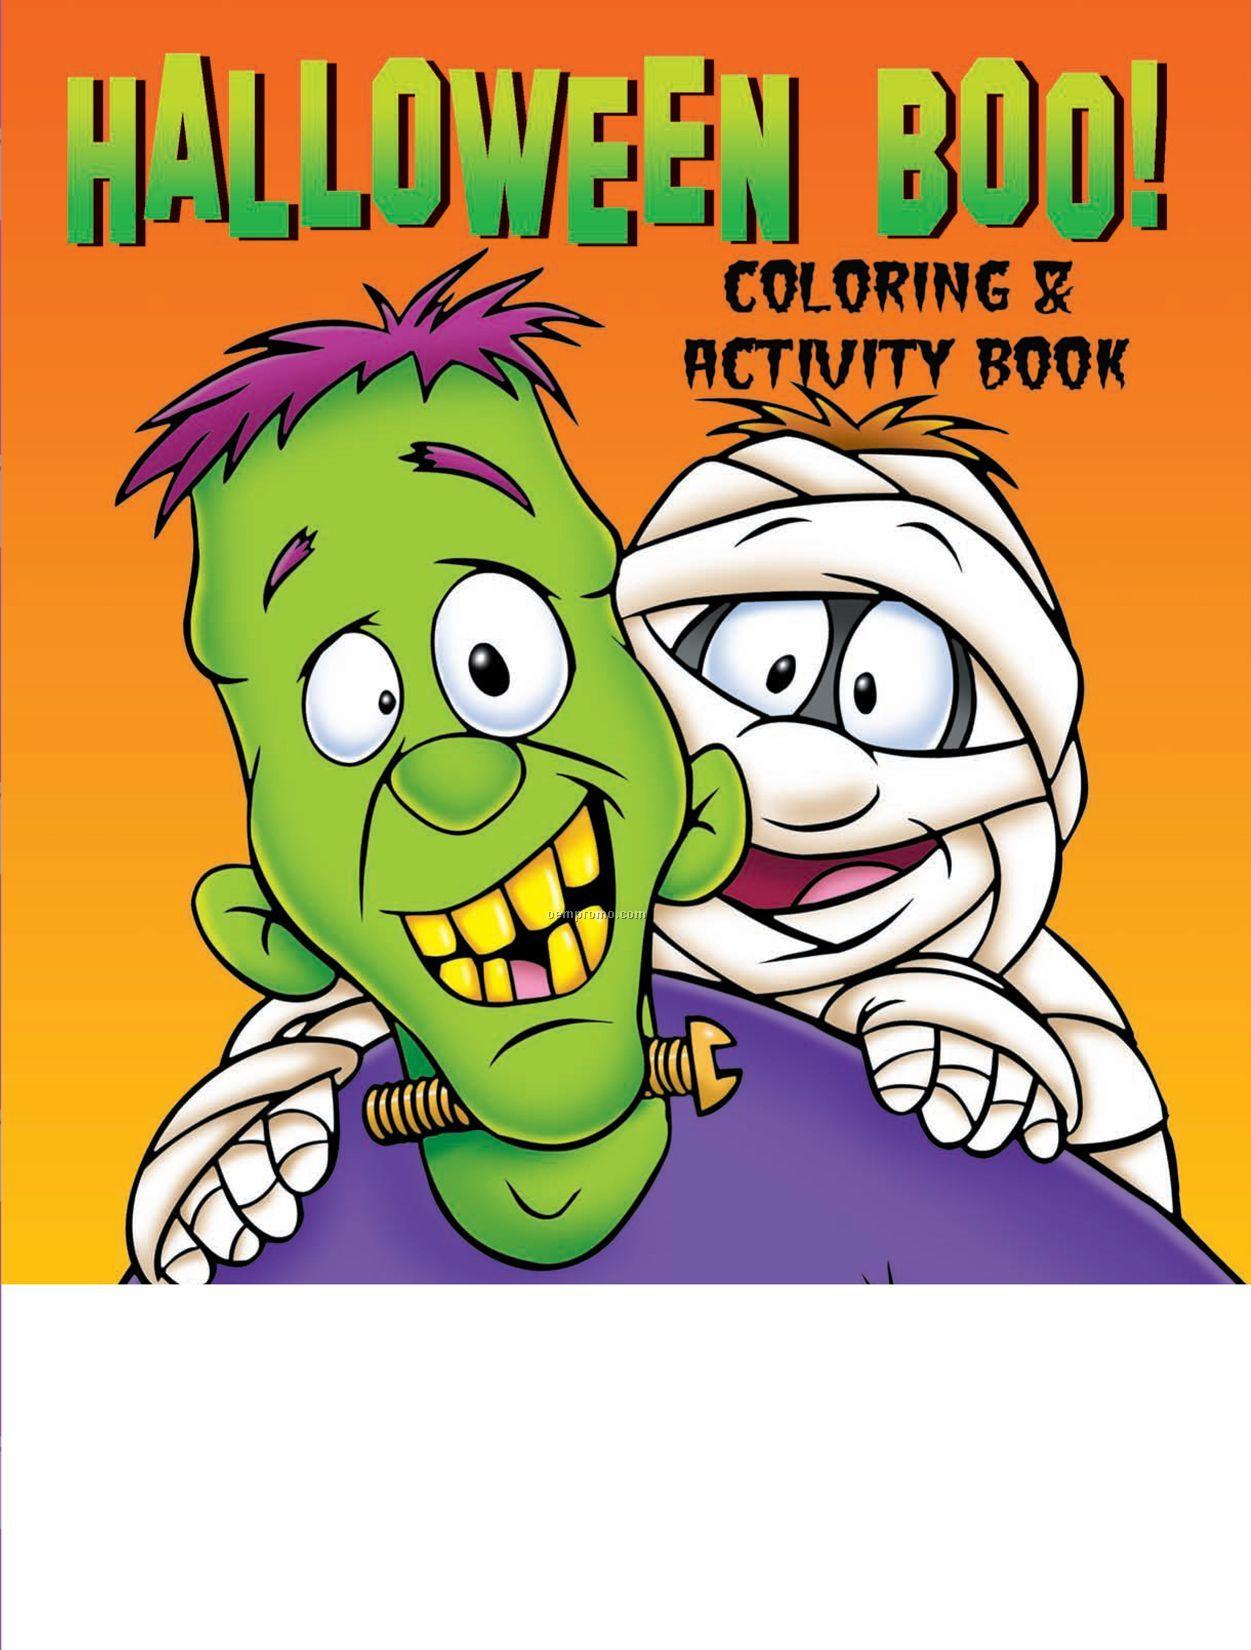 Halloween Boo! Coloring Book